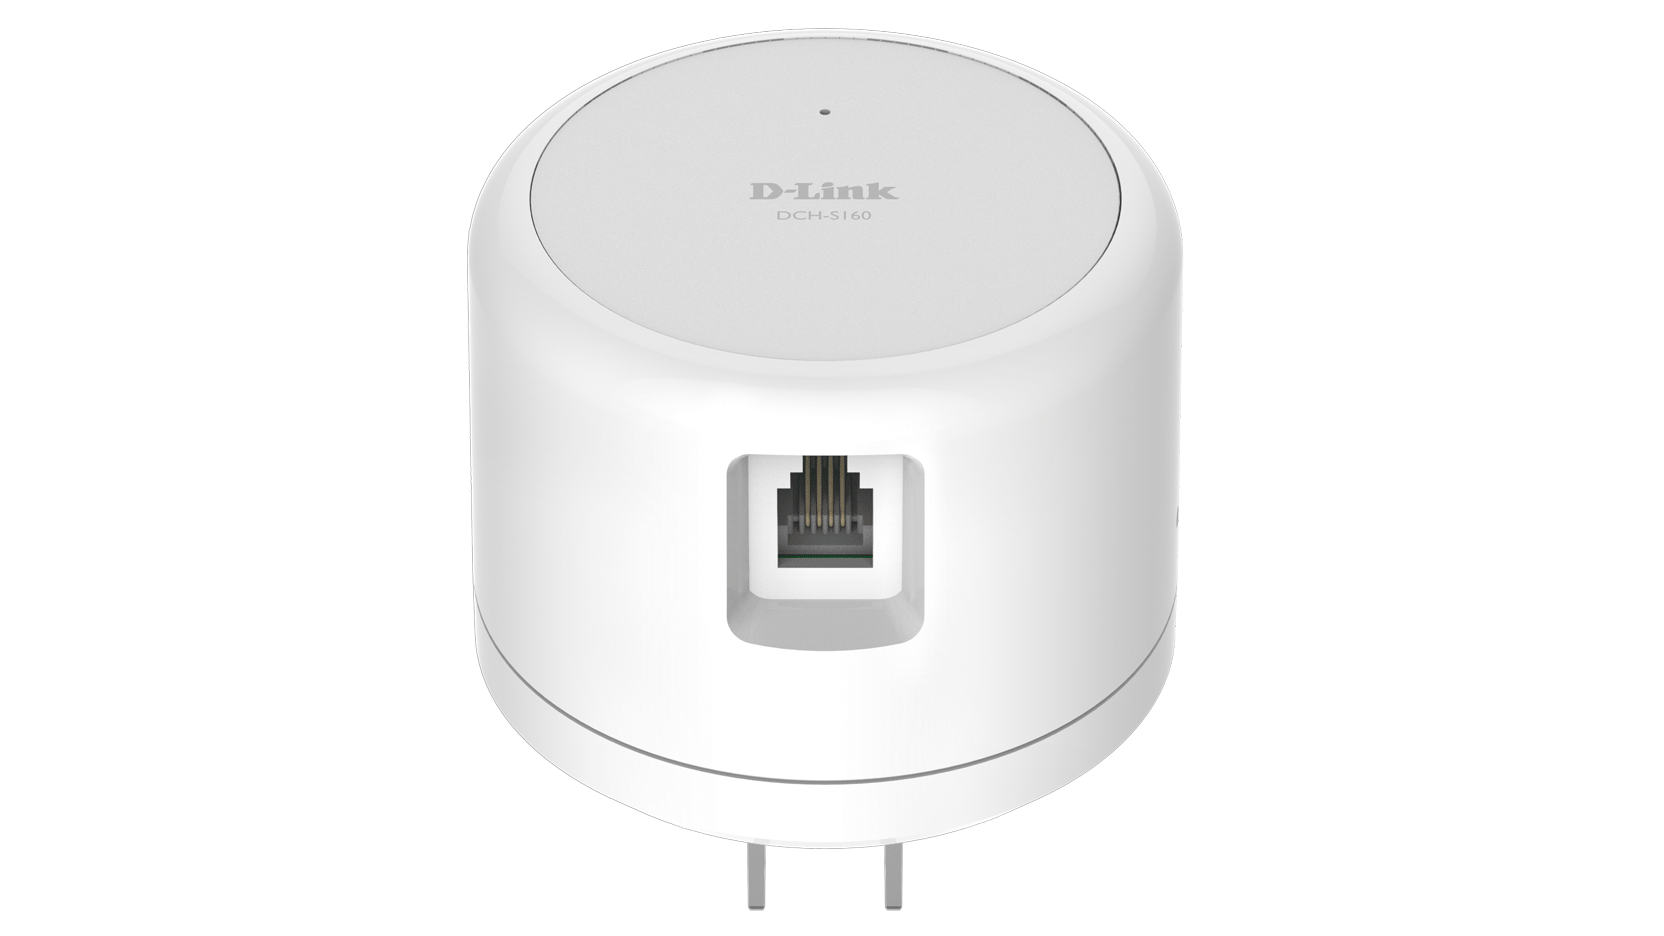 D-Link DCH-S160/E Detektor úniku vody mydlink™ Home